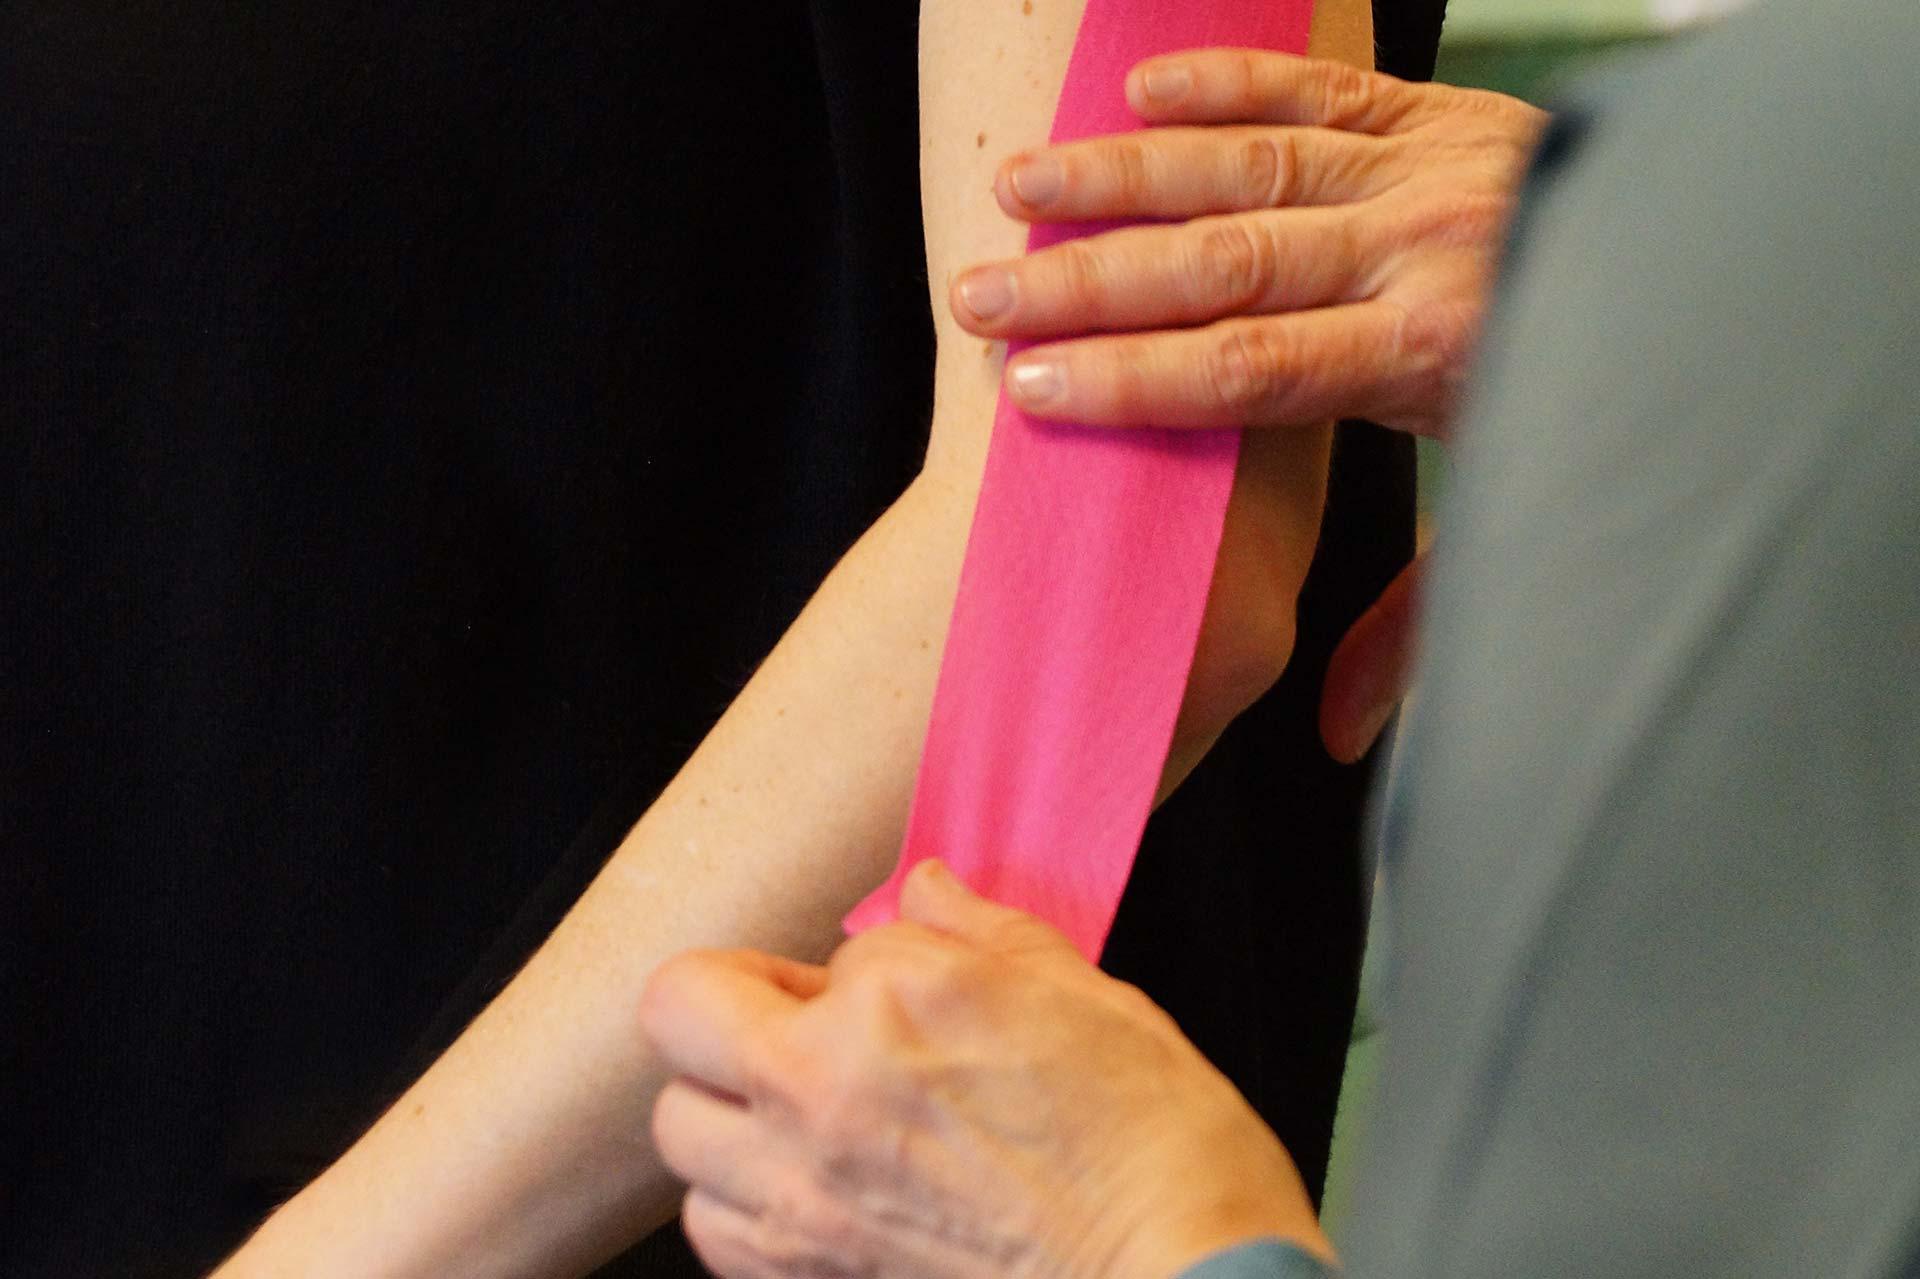 akupunktur-patches-heilpraktiker